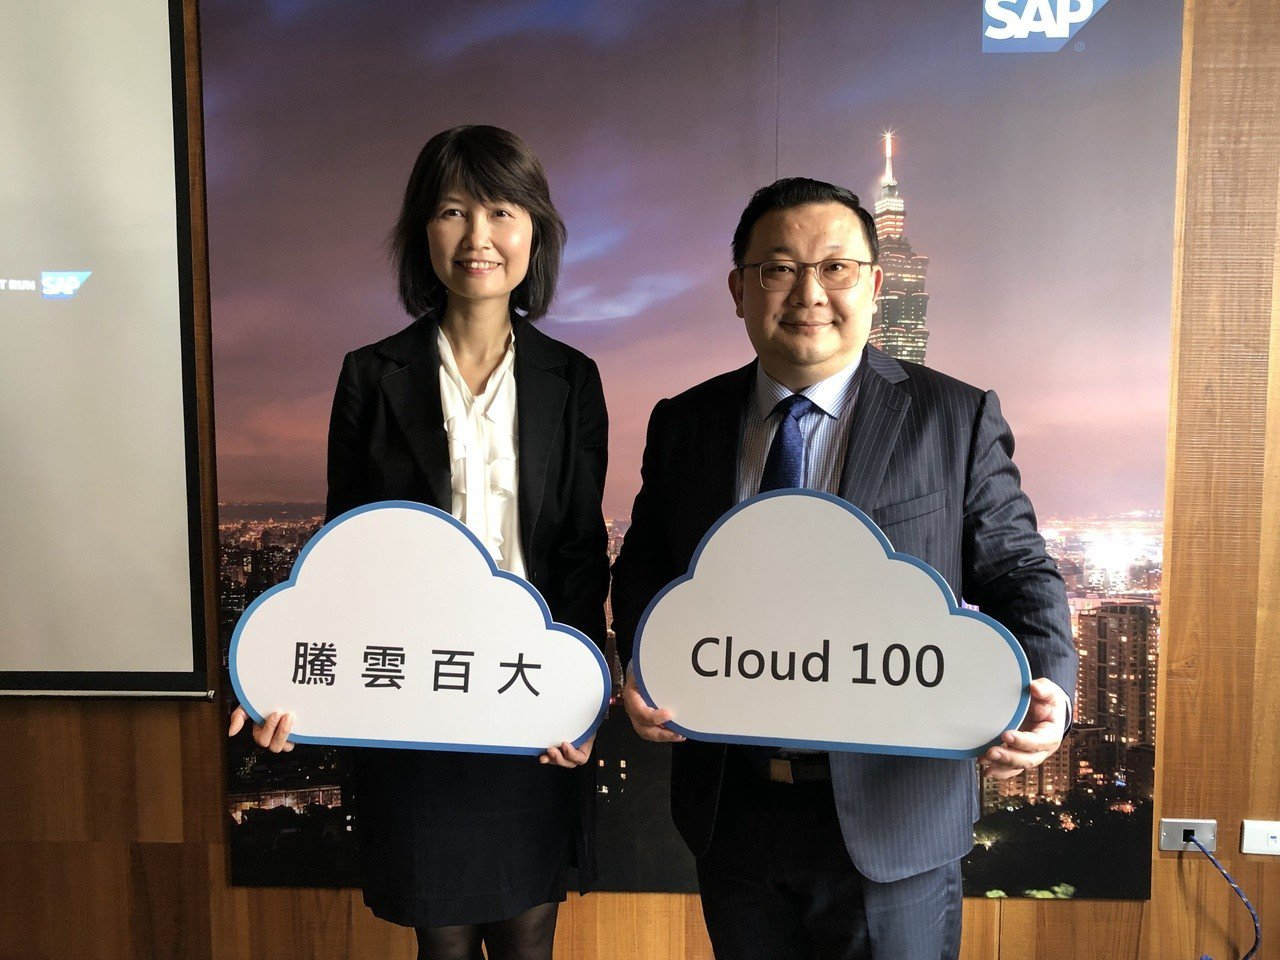 SAP全球副總裁暨台灣區總經理謝良承(右)。記者蕭君暉/攝影